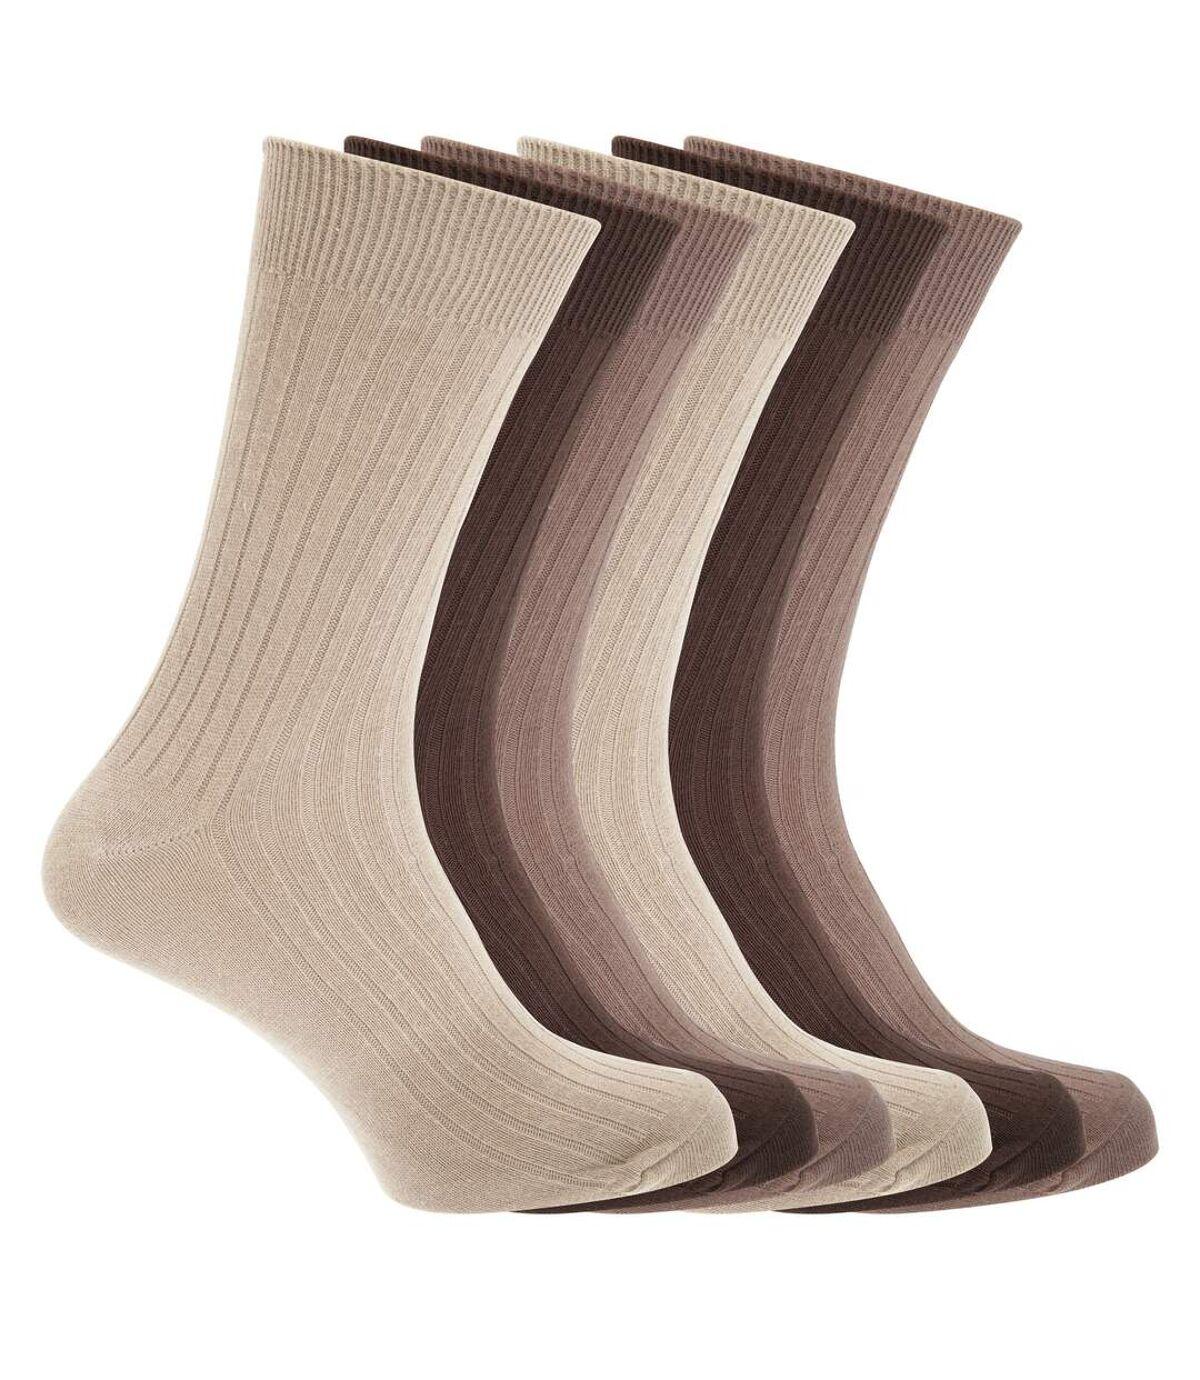 FLOSO Mens Ribbed 100% Cotton Socks (6 Pairs) (Dark Brown/Light Brown/Beige) - UTMB466